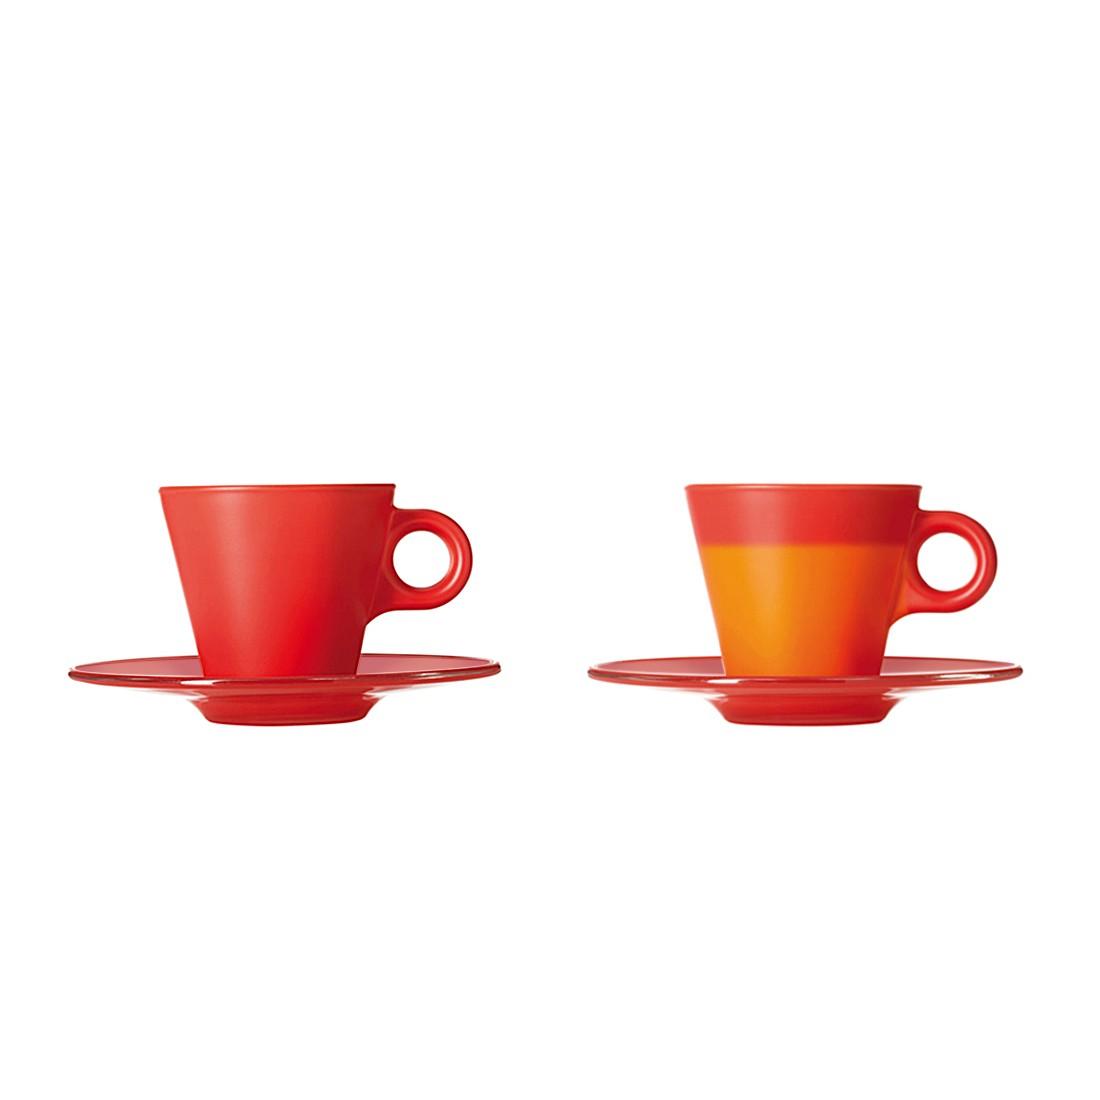 Espressotassen Ooh Magico (2er-Set) – Rot, Leonardo jetzt kaufen